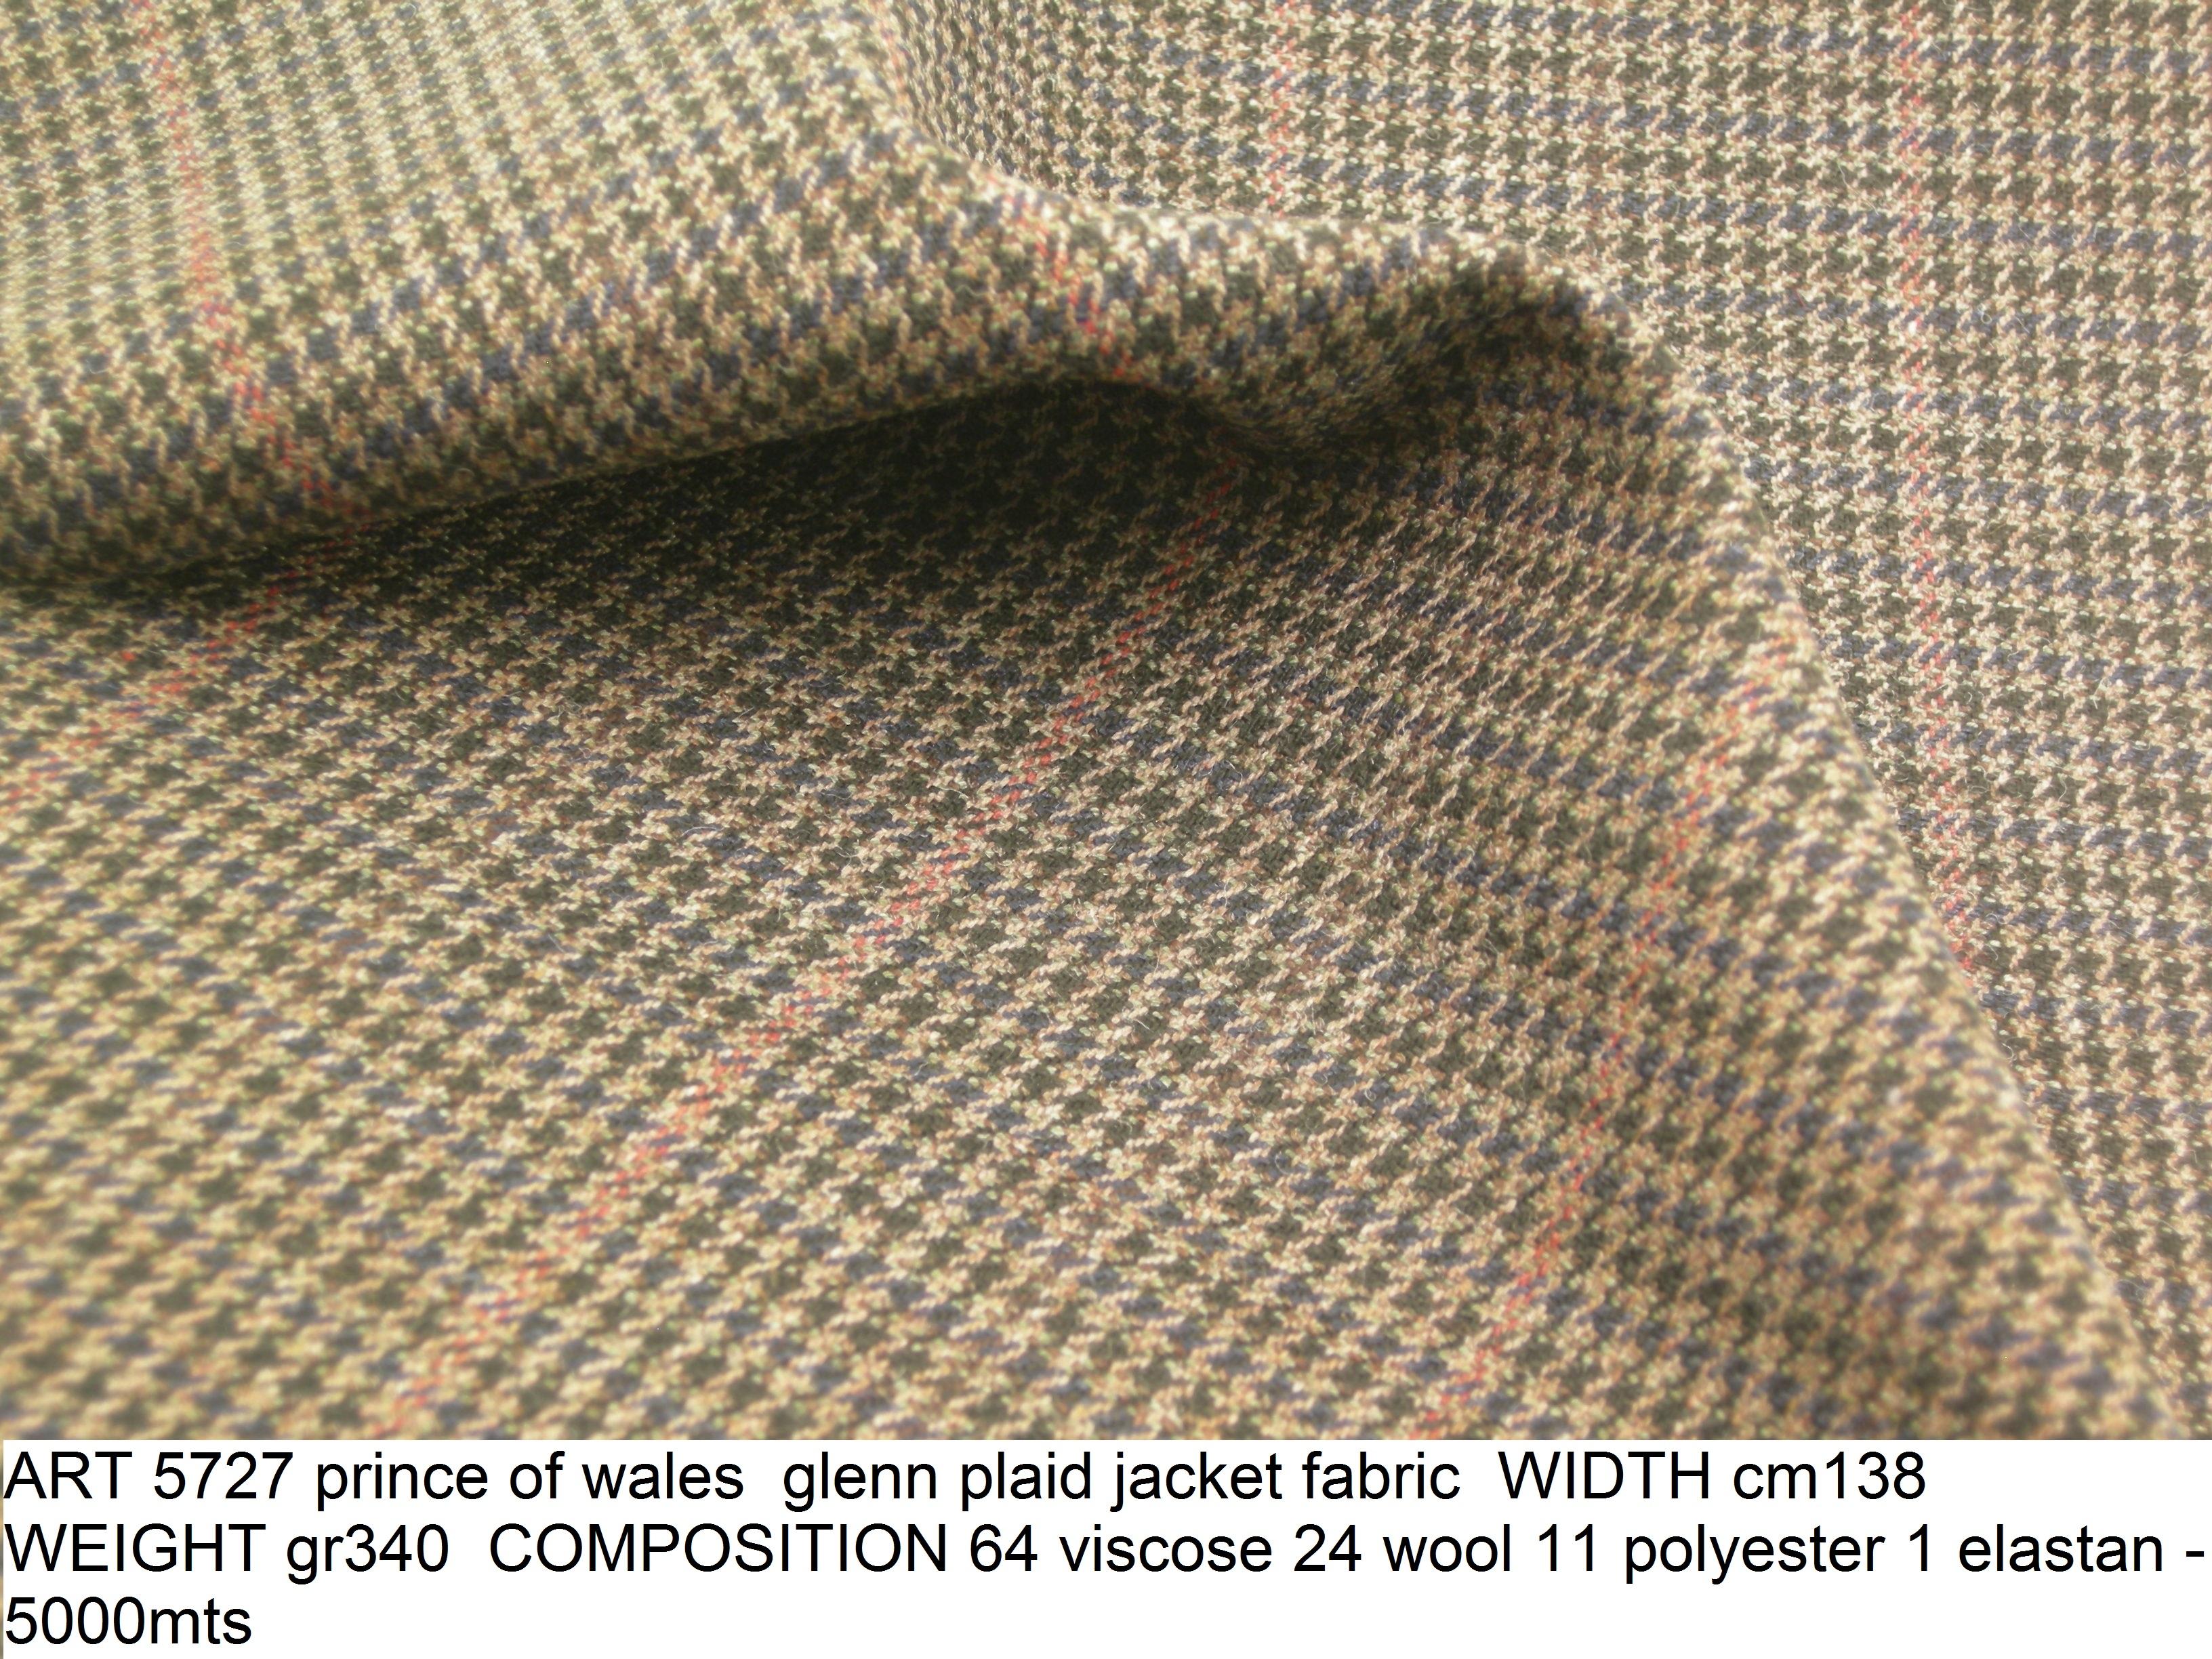 ART 5727 prince of wales glenn plaid jacket fabric WIDTH cm138 WEIGHT gr340 COMPOSITION 64 viscose 24 wool 11 polyester 1 elastan - 5000mts